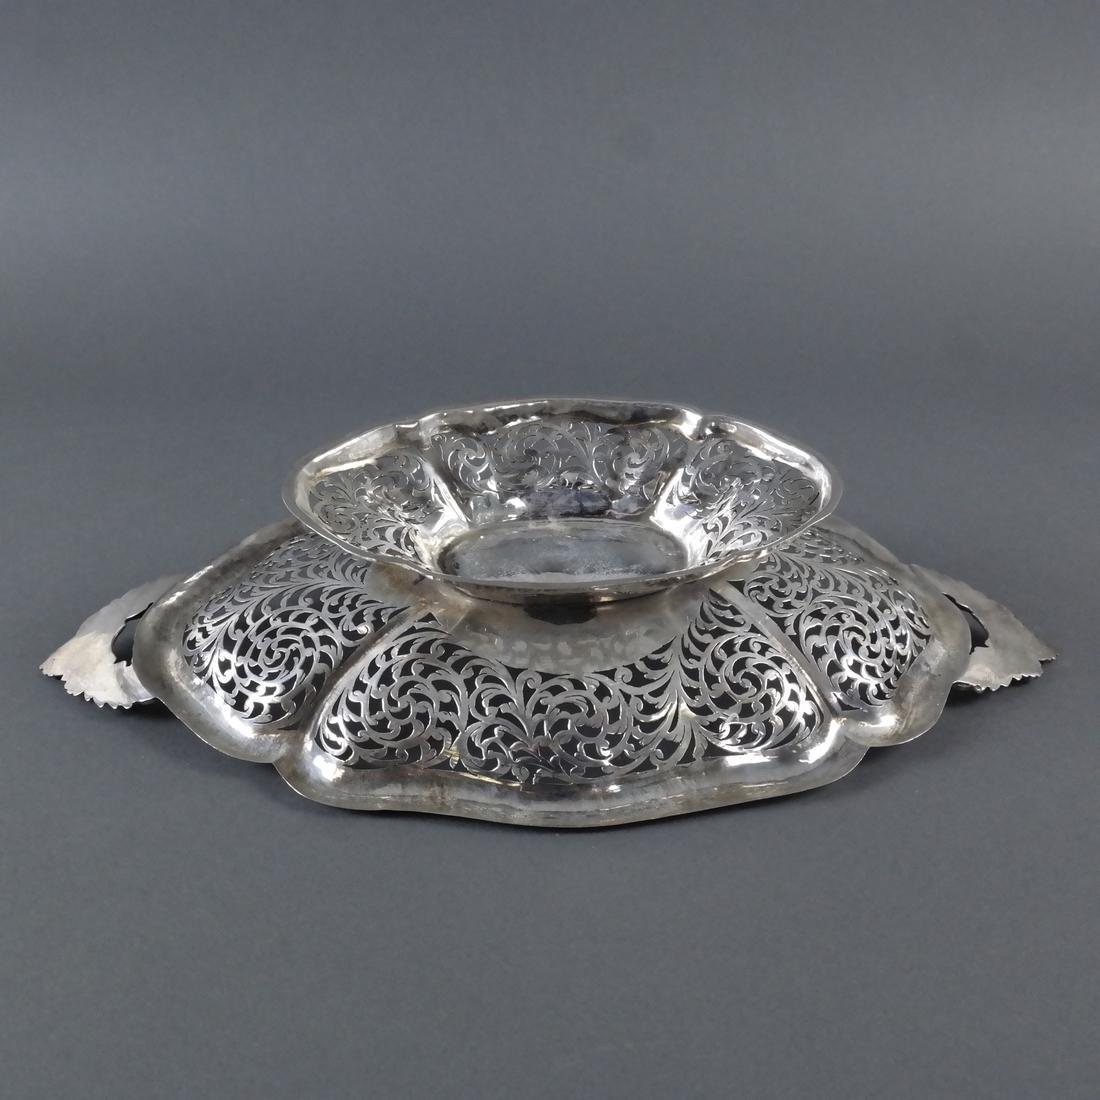 .900 Standard Silver Pierced Compote - 8